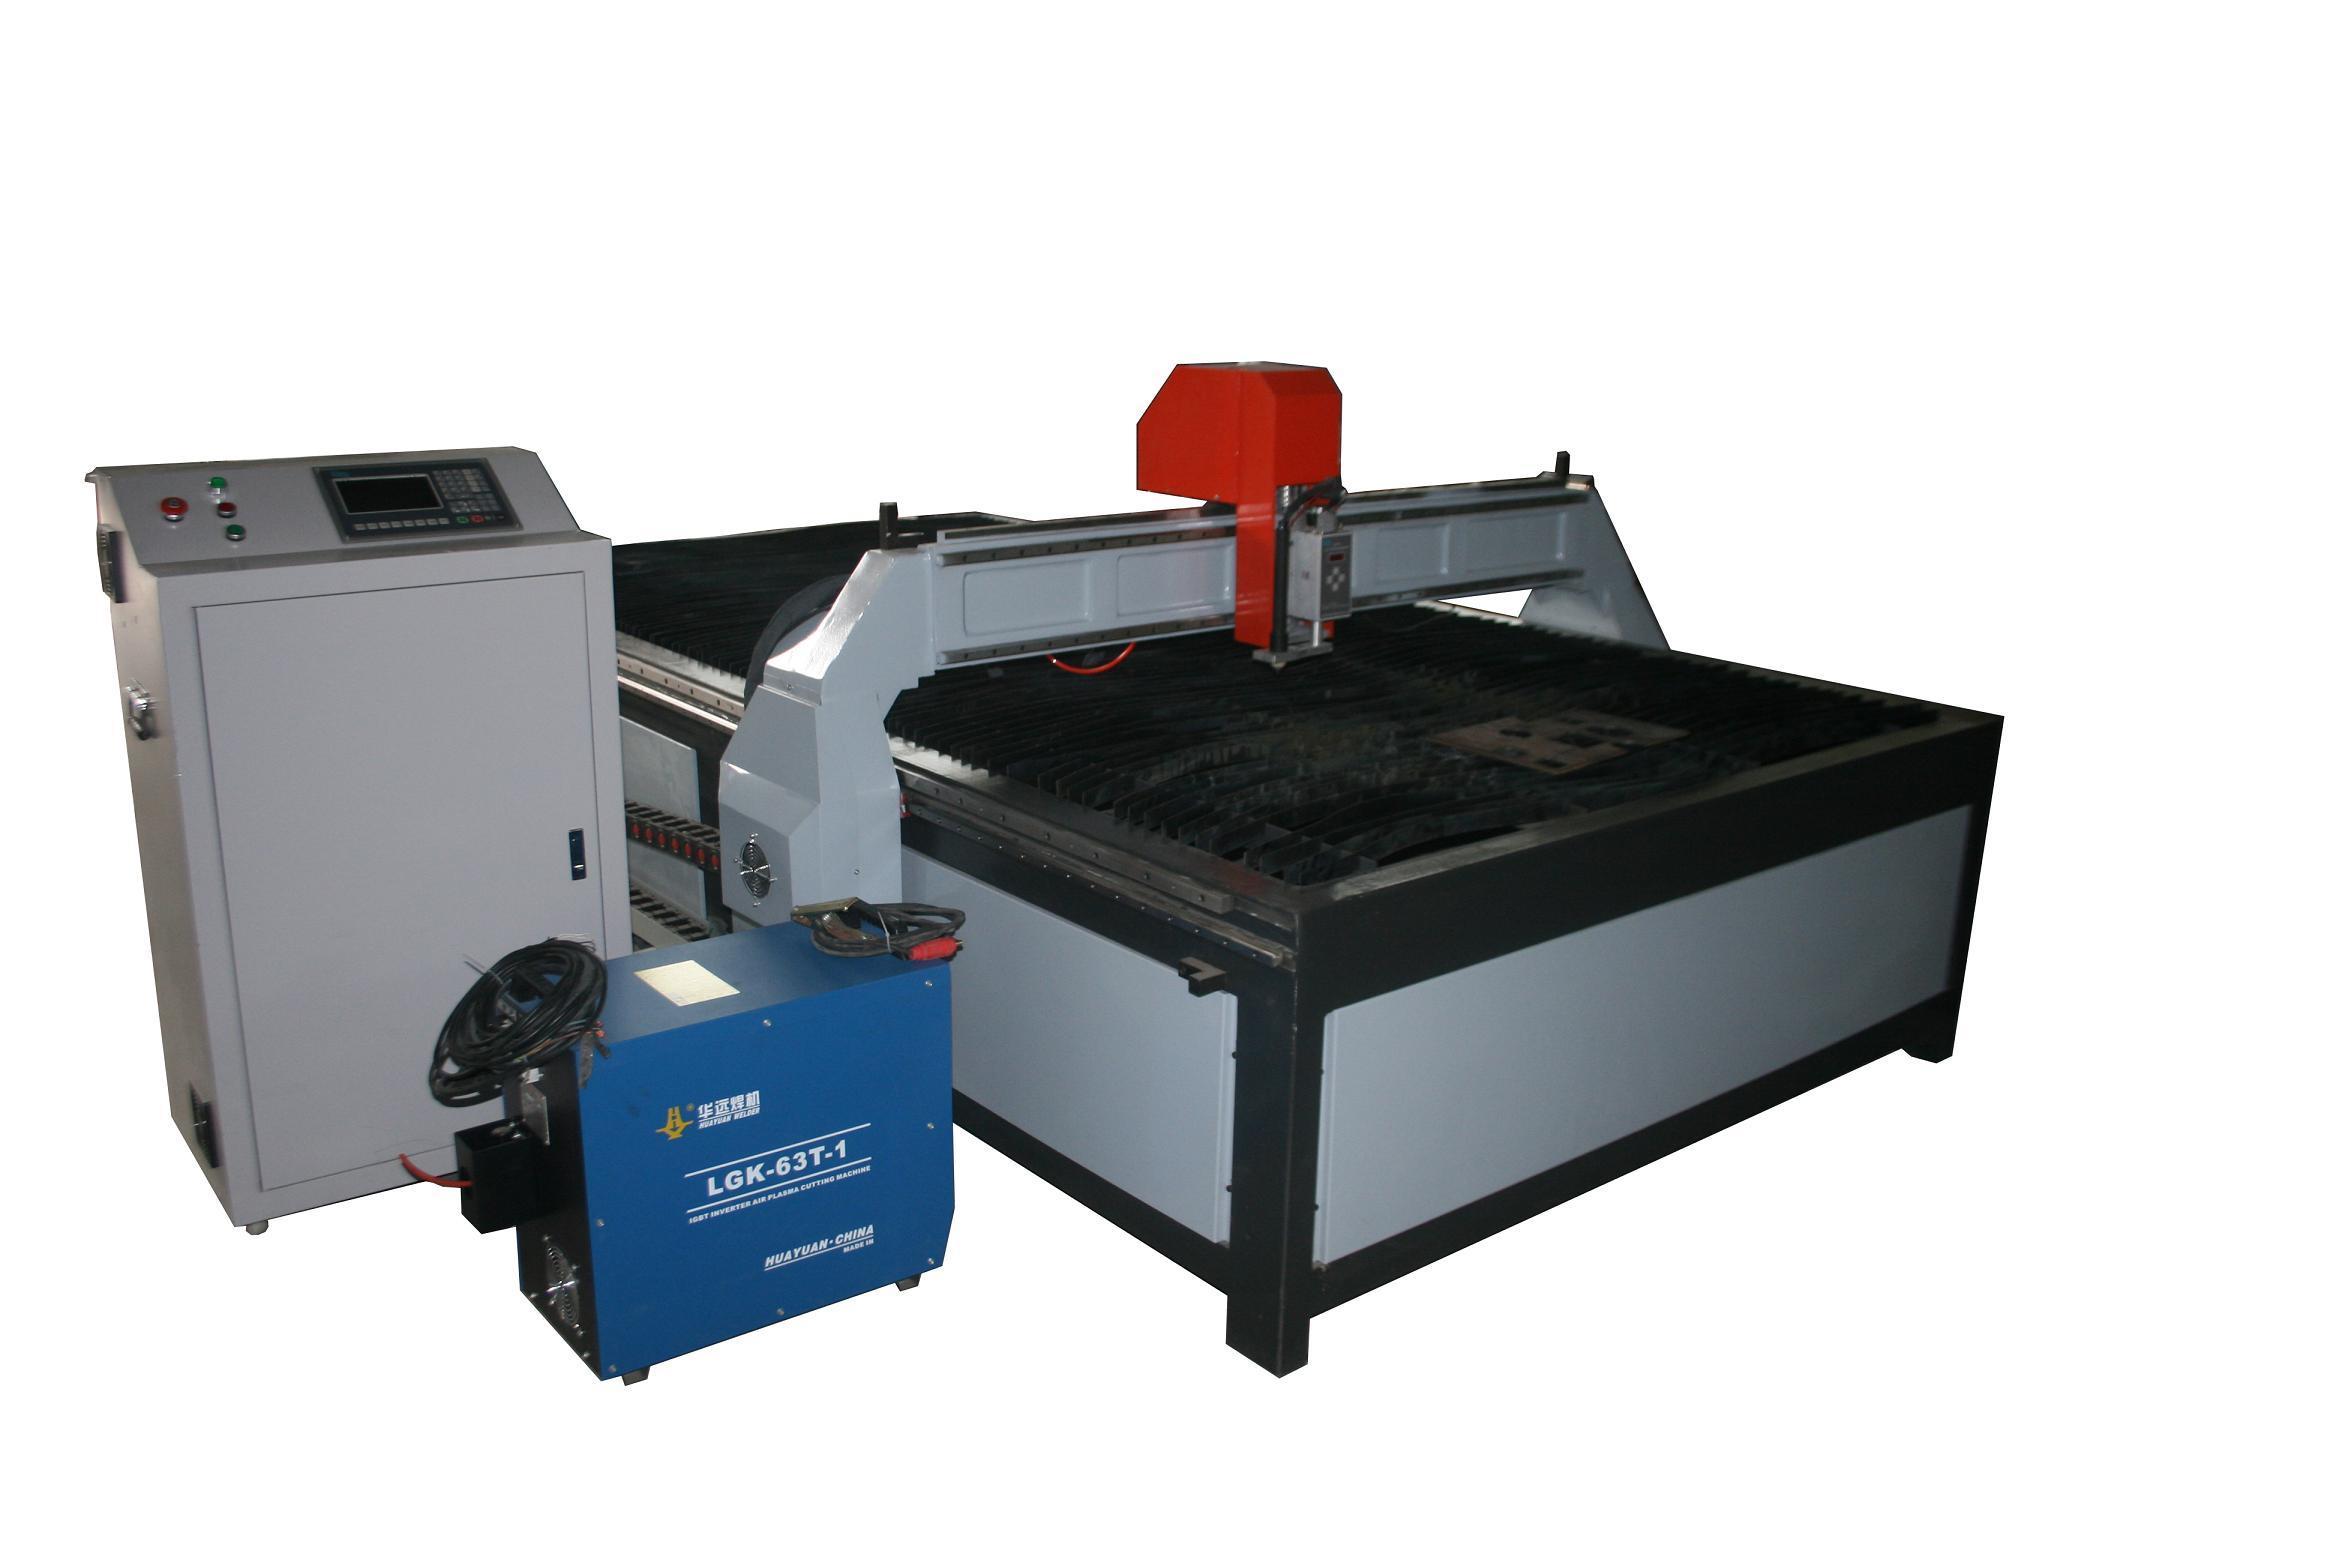 Steel Cutters Metal Cutting billing assistant cover letter – Steel Cutters Metal Cutting